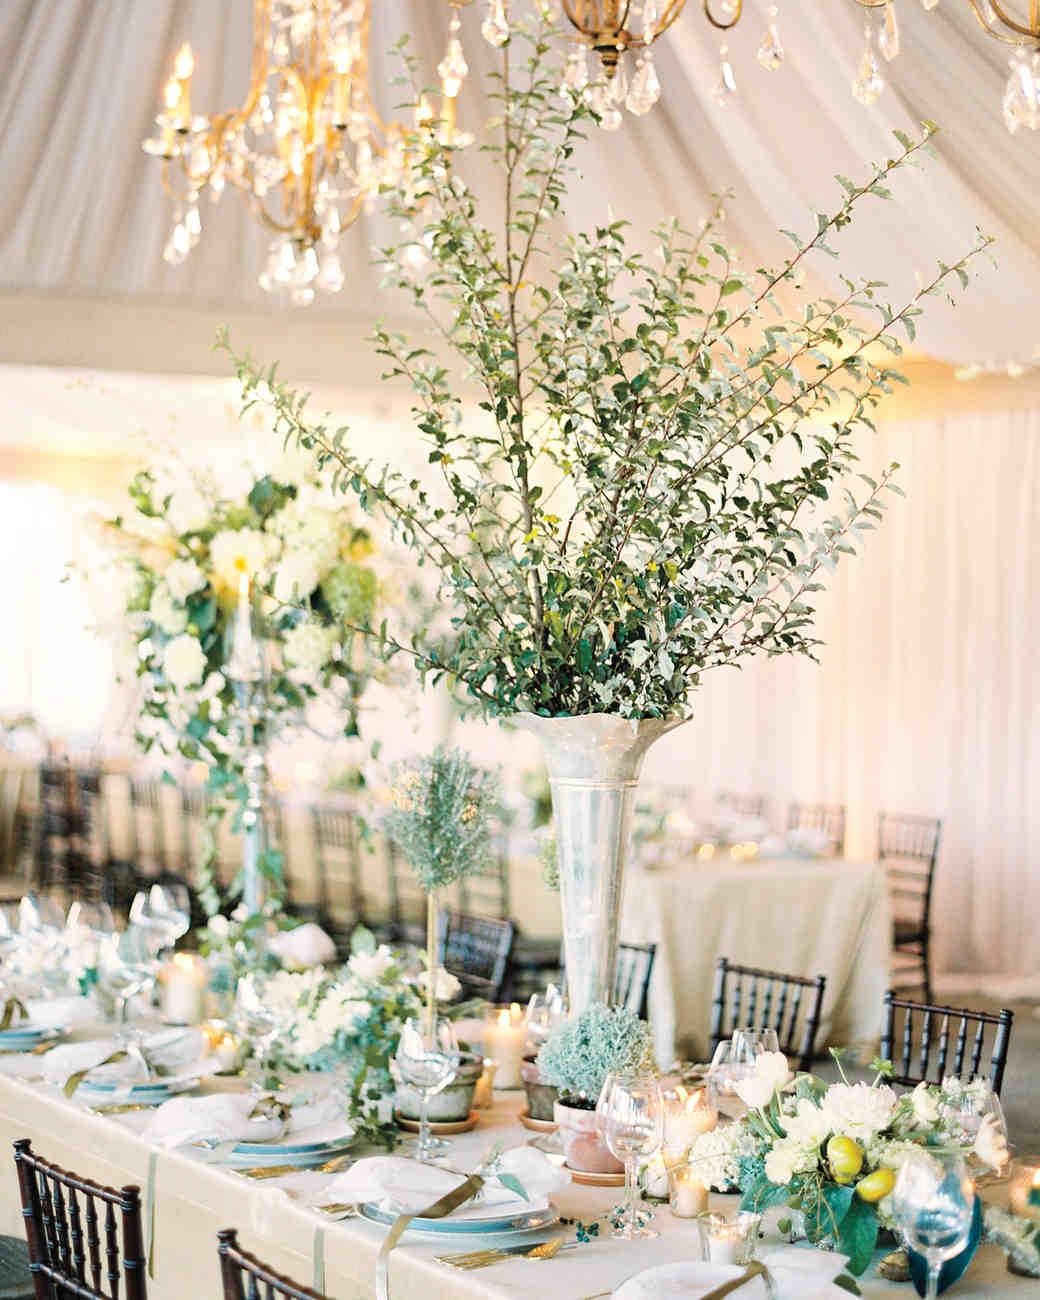 table-setting-centerpiece-flower-004771-r-1-008-mwds110148.jpg